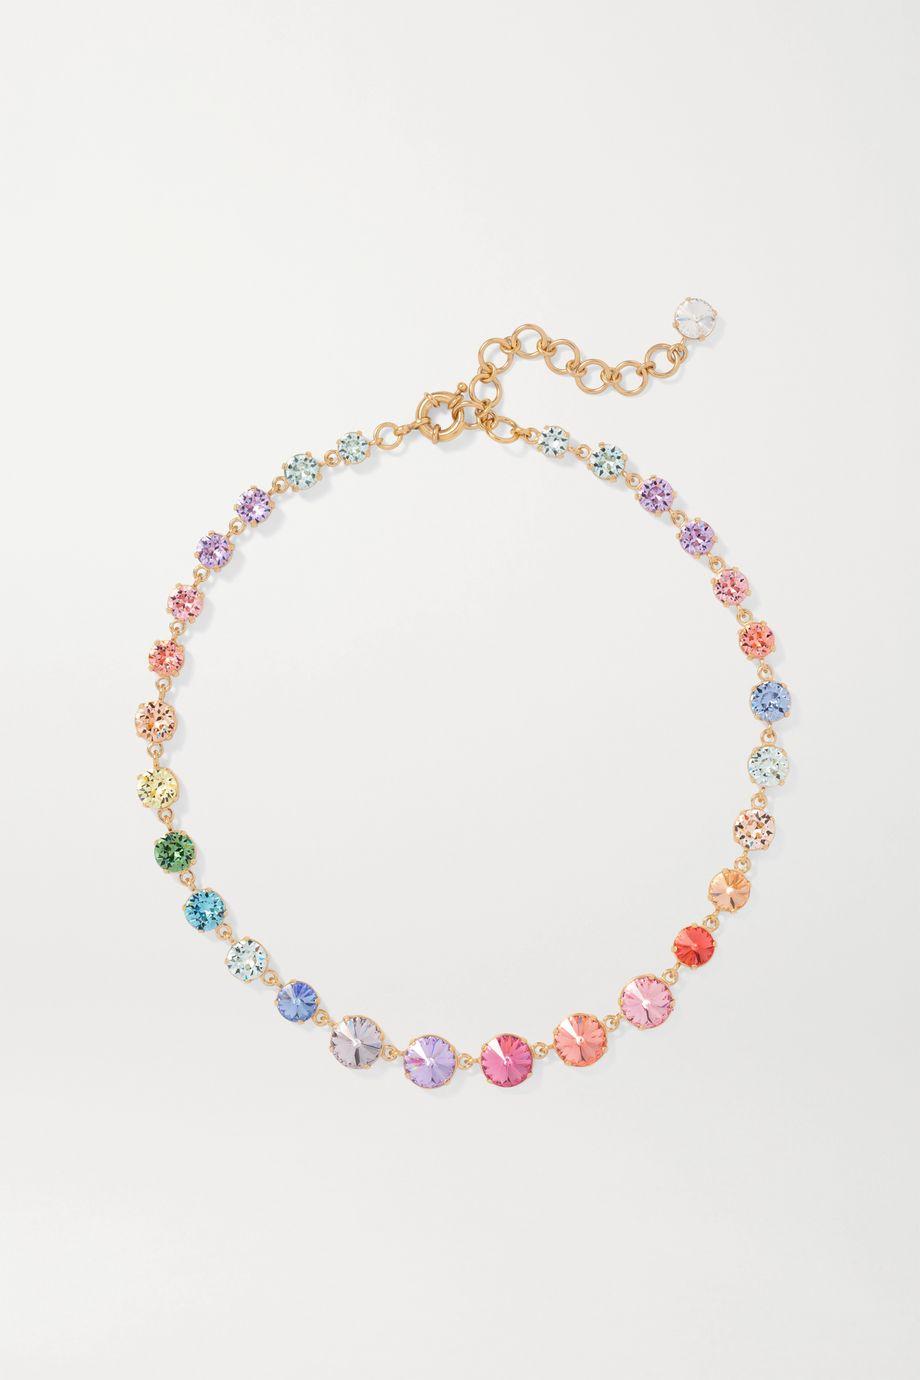 Roxanne Assoulin Technicolor Mini vergoldete Kette mit Swarovski-Kristallen